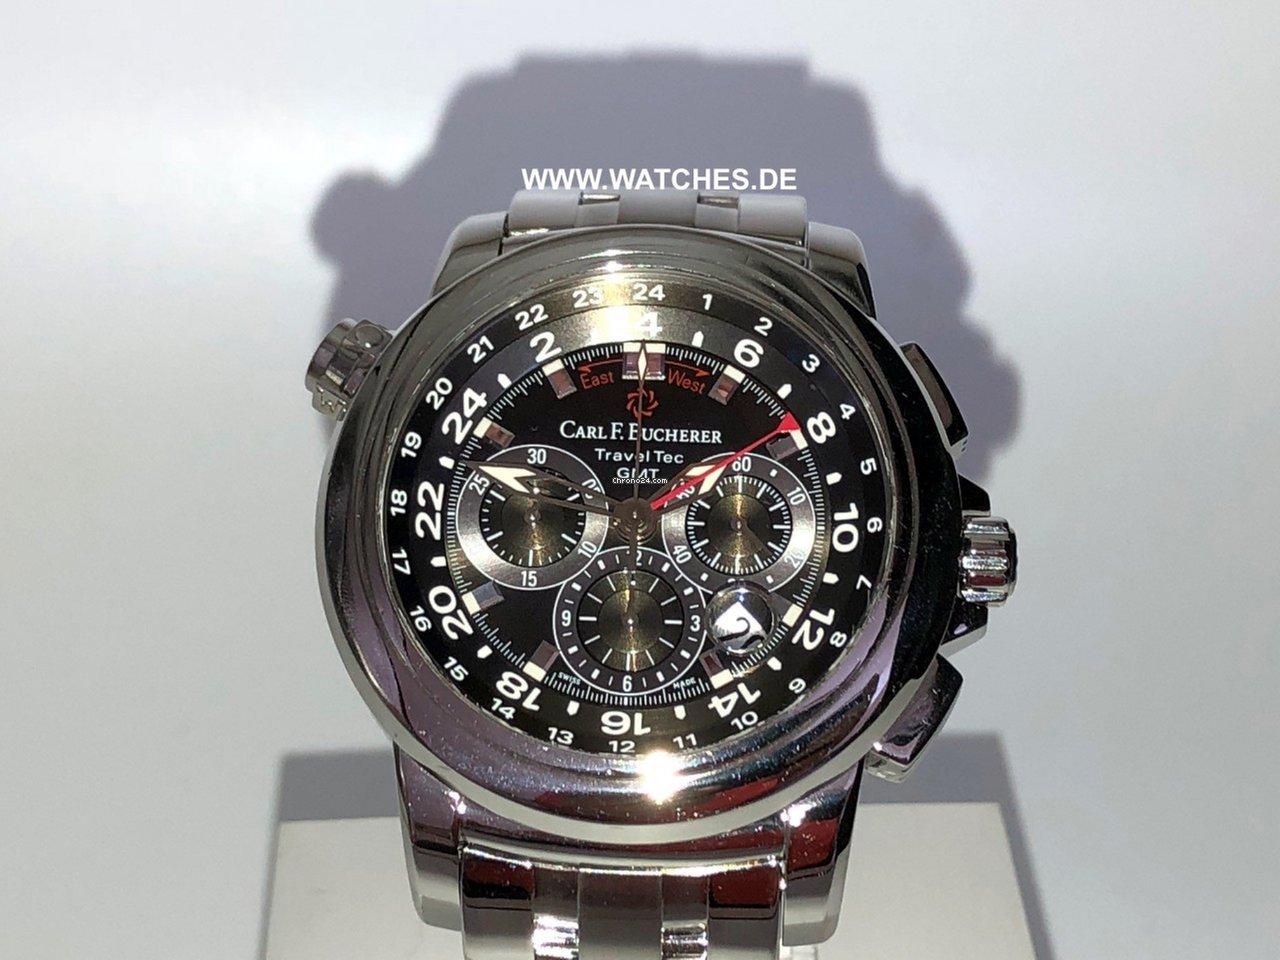 d37ba47c235e Relojes Carl F. Bucherer - Precios de todos los relojes Carl F. Bucherer en  Chrono24